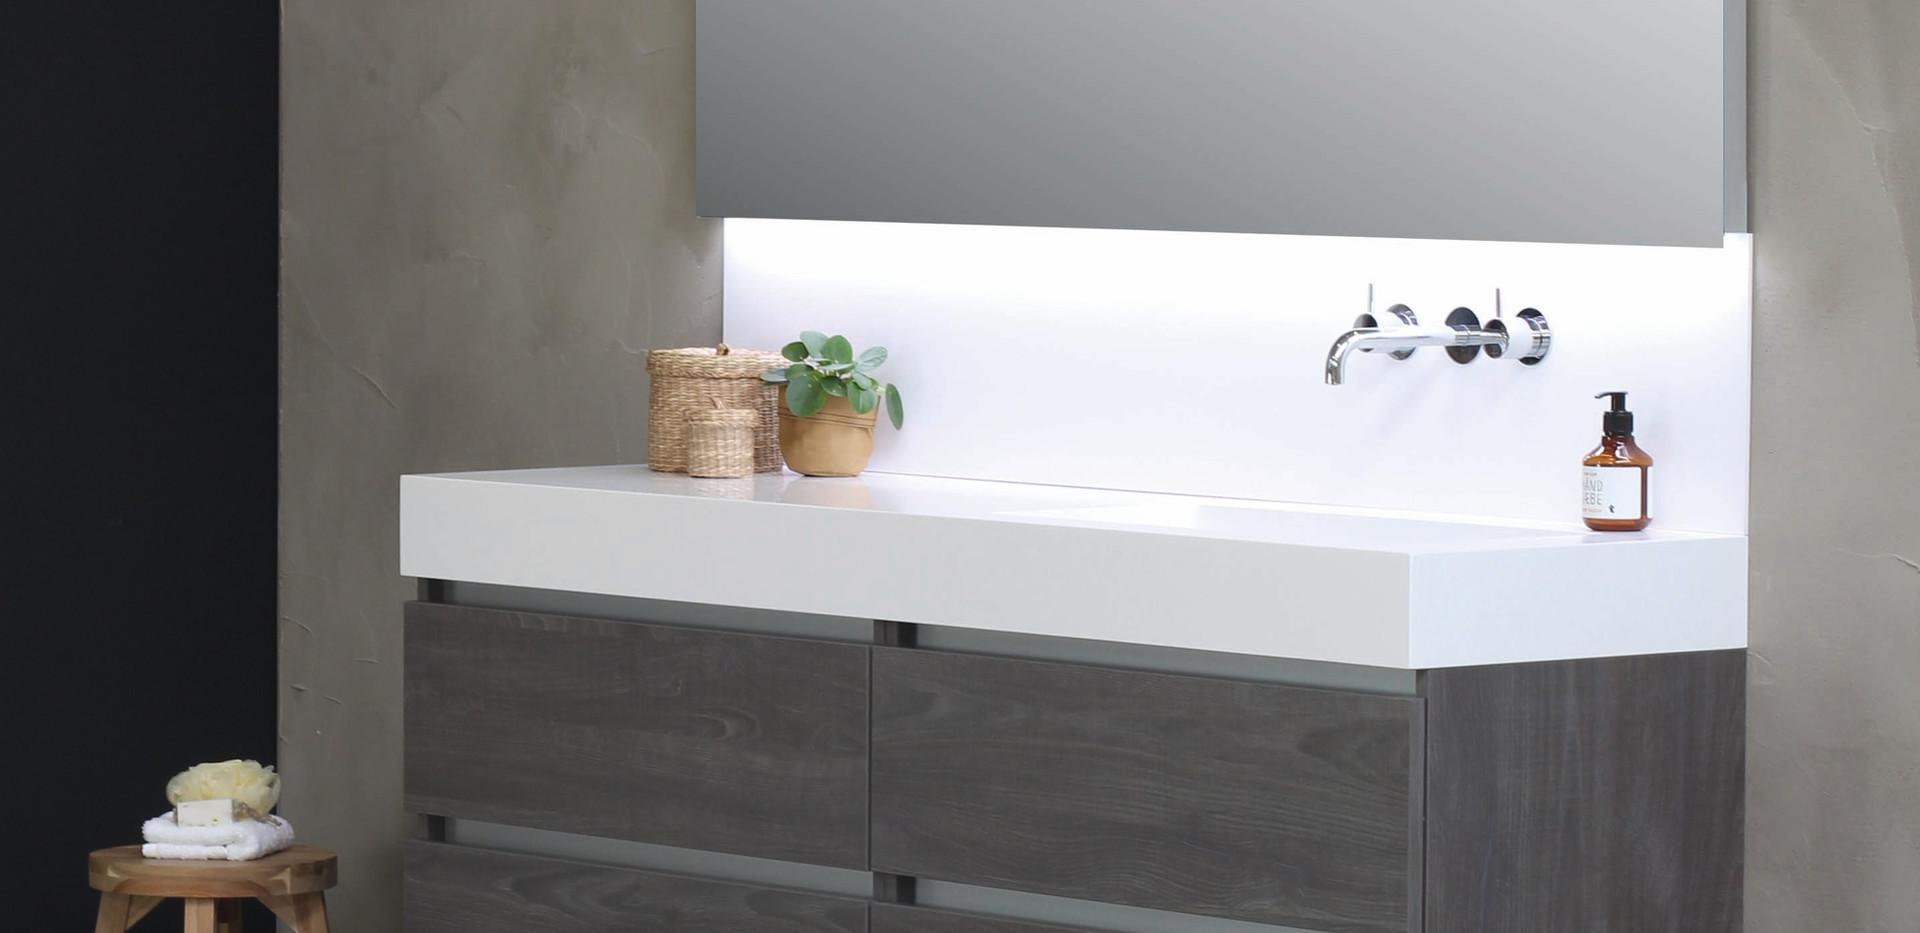 Spazio - håndvask med høj kant + møbel i original grå